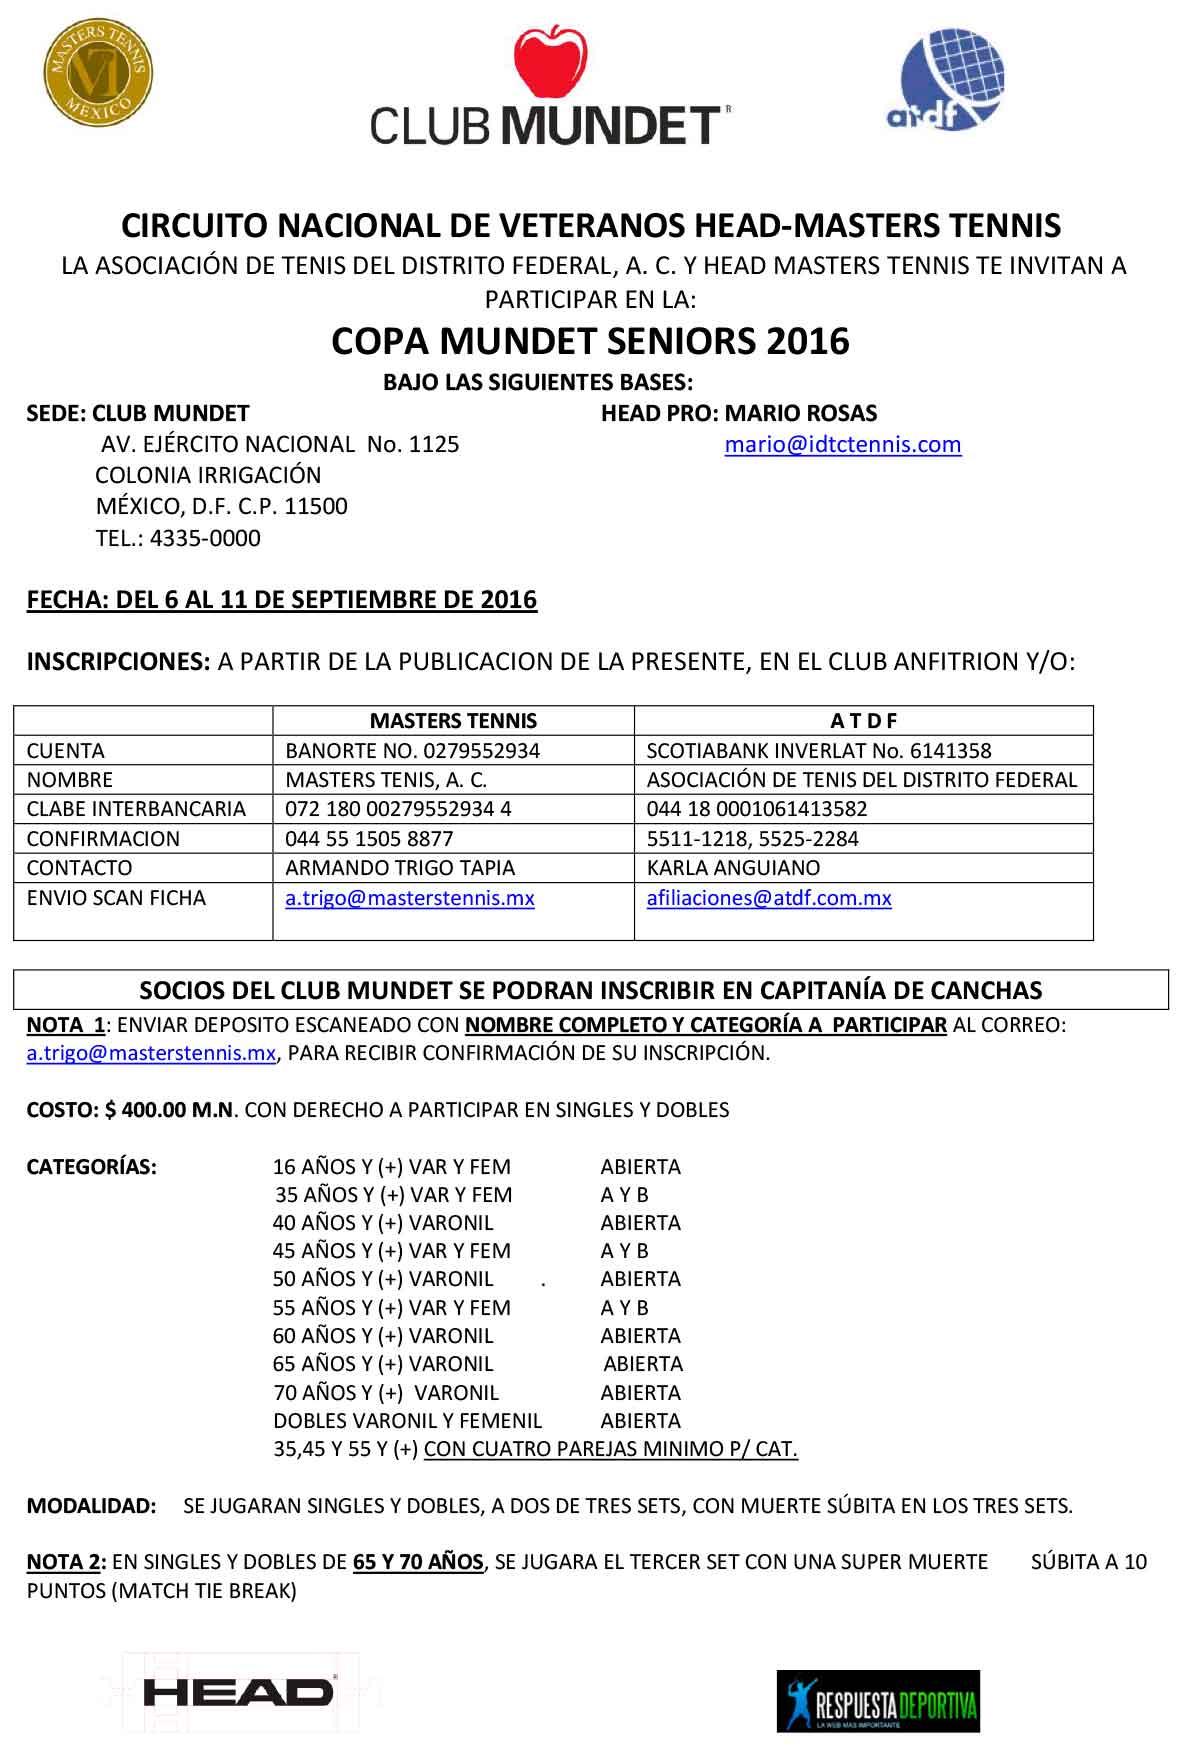 CONV-COPA-MUNDET-SENIORS-2016-1